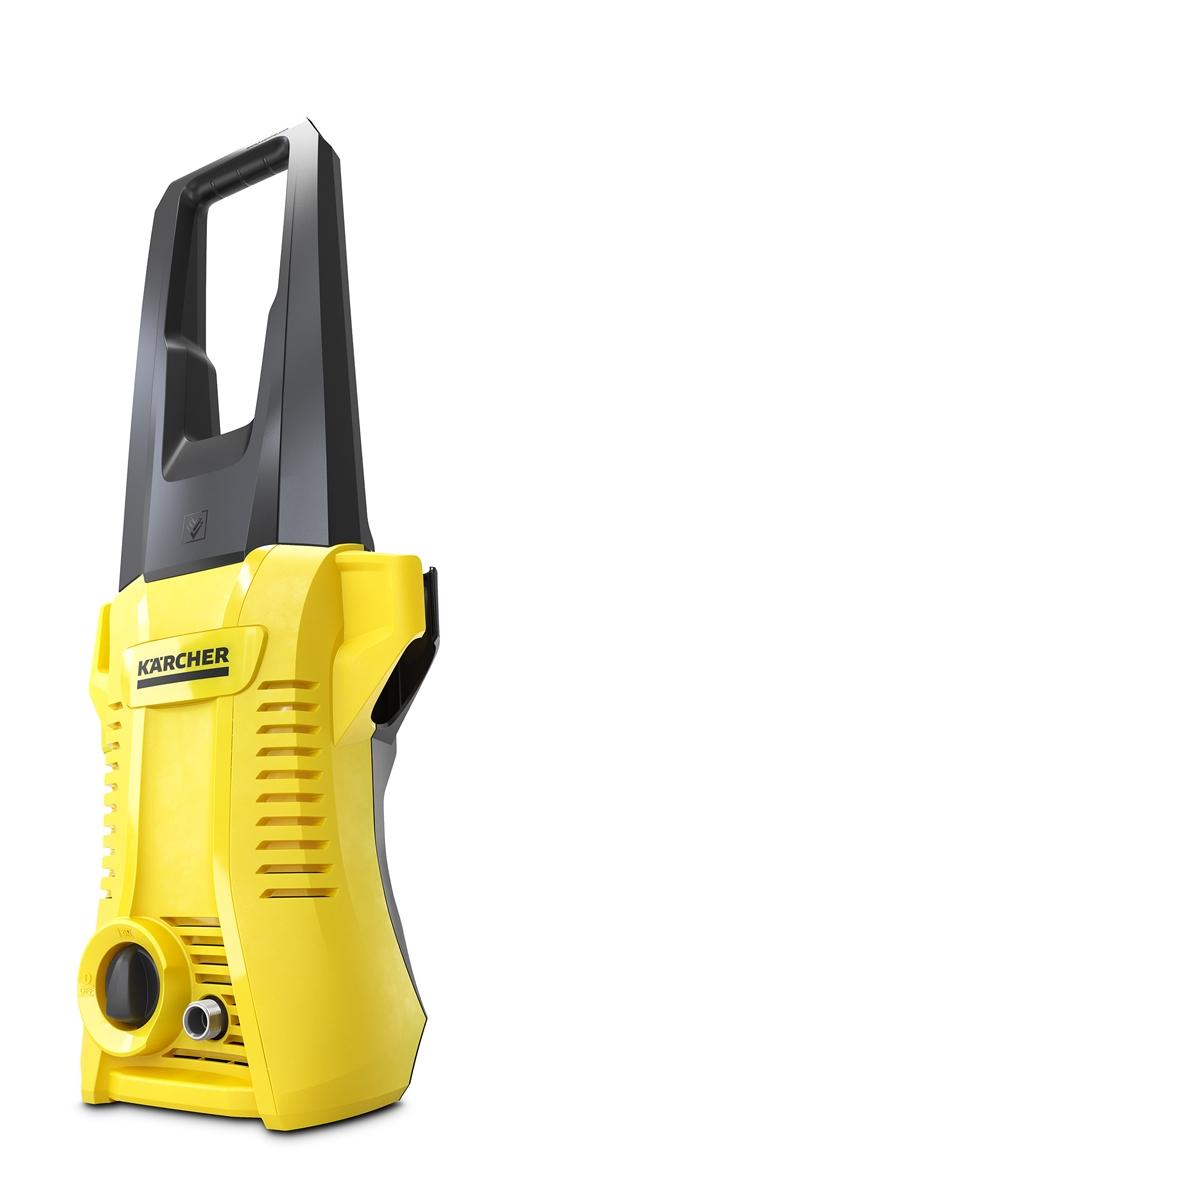 Lavadora K1 Portátil 127V - Disponível Em Breve